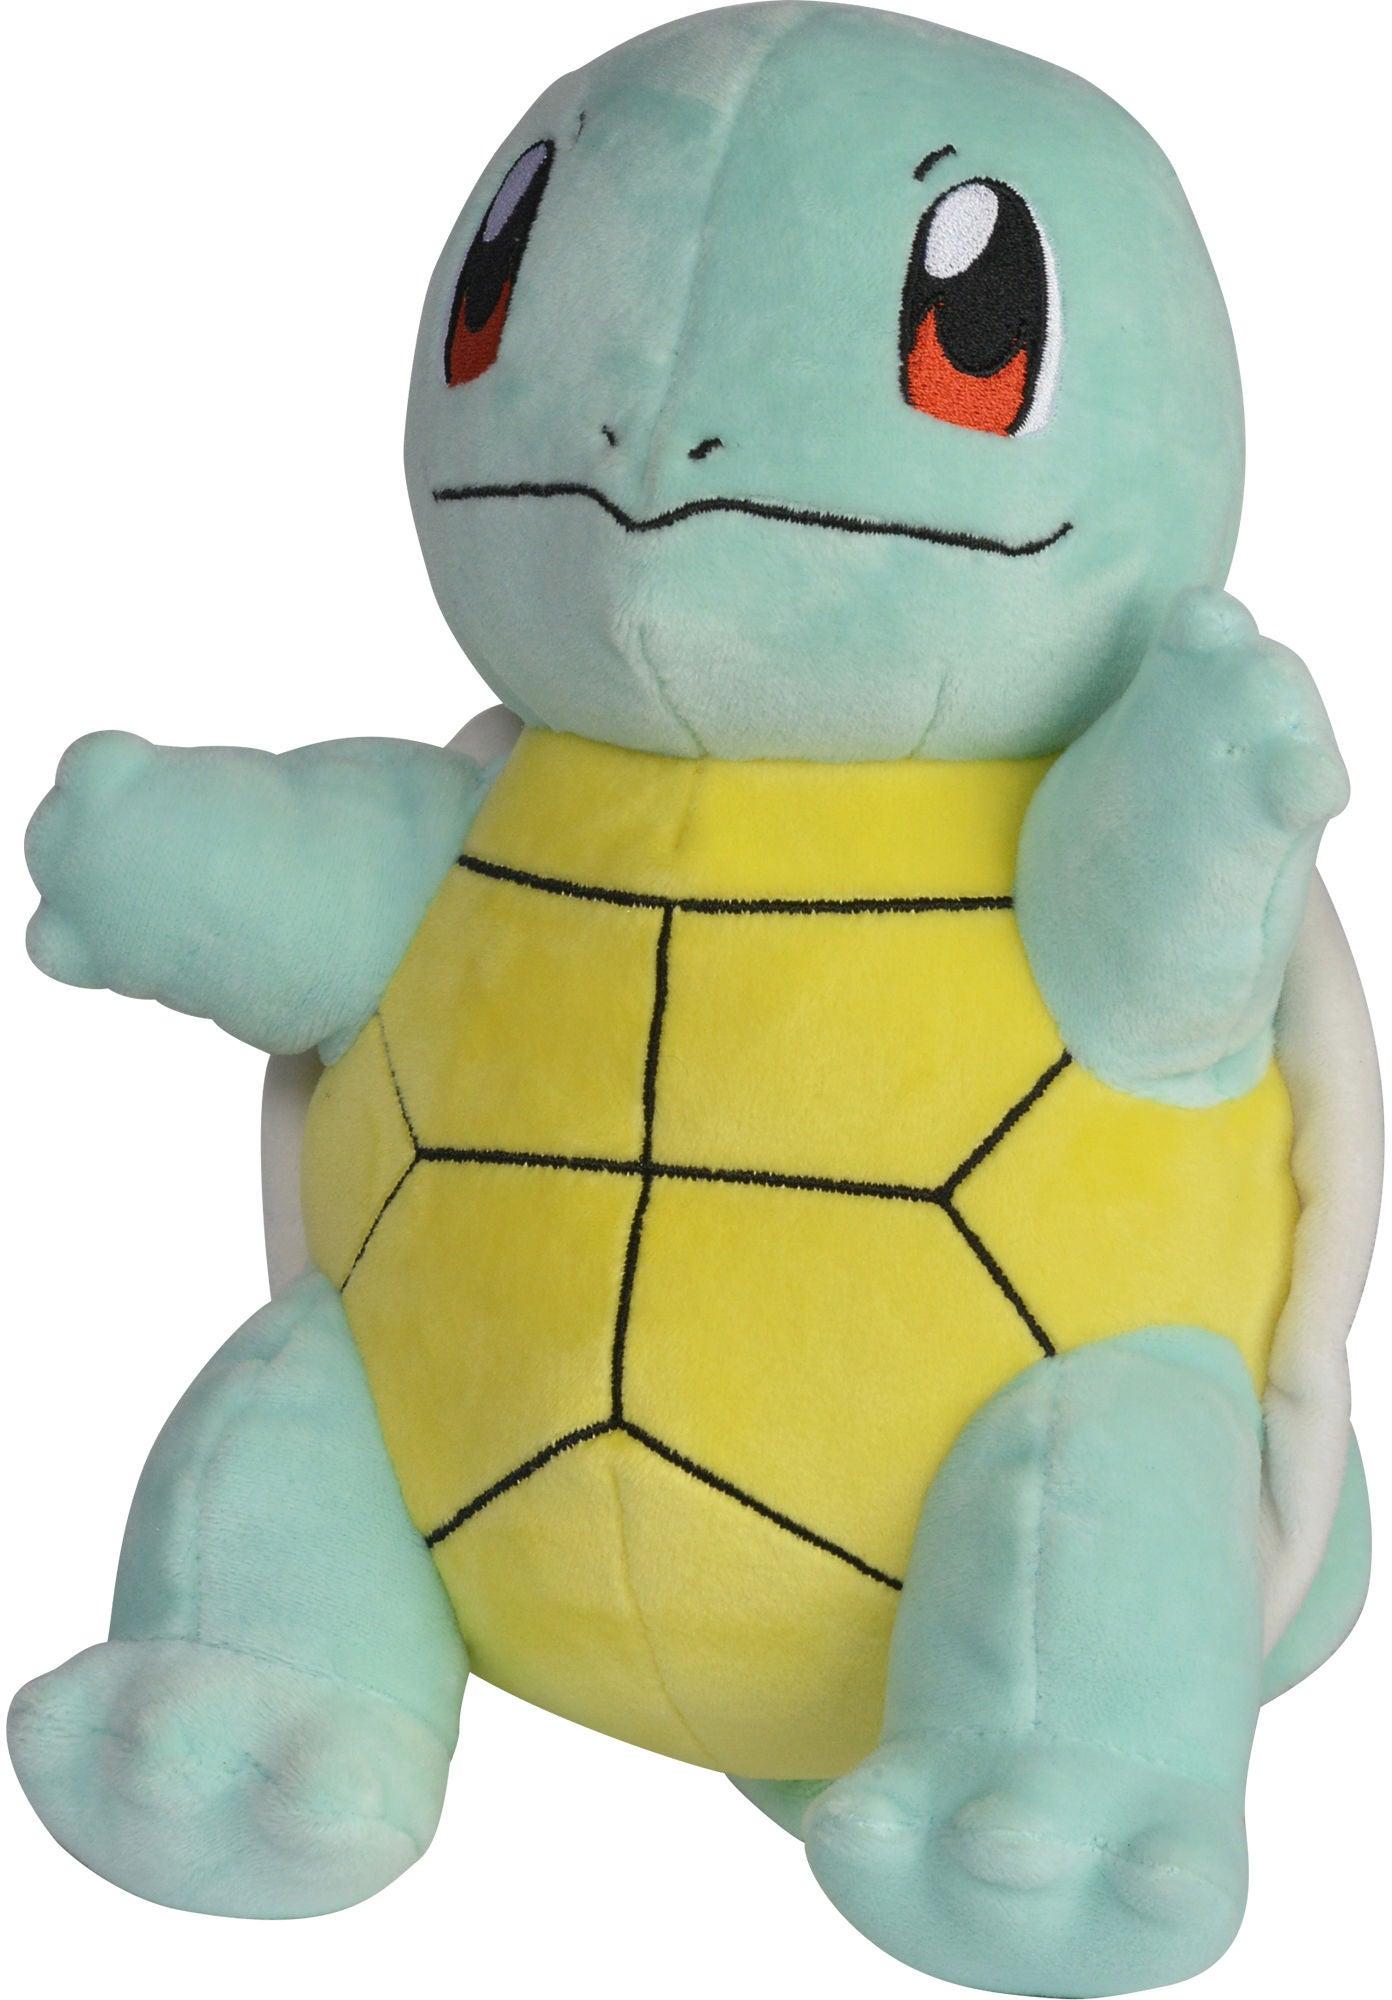 Pokémon Kosedyr Plysj Squirtle